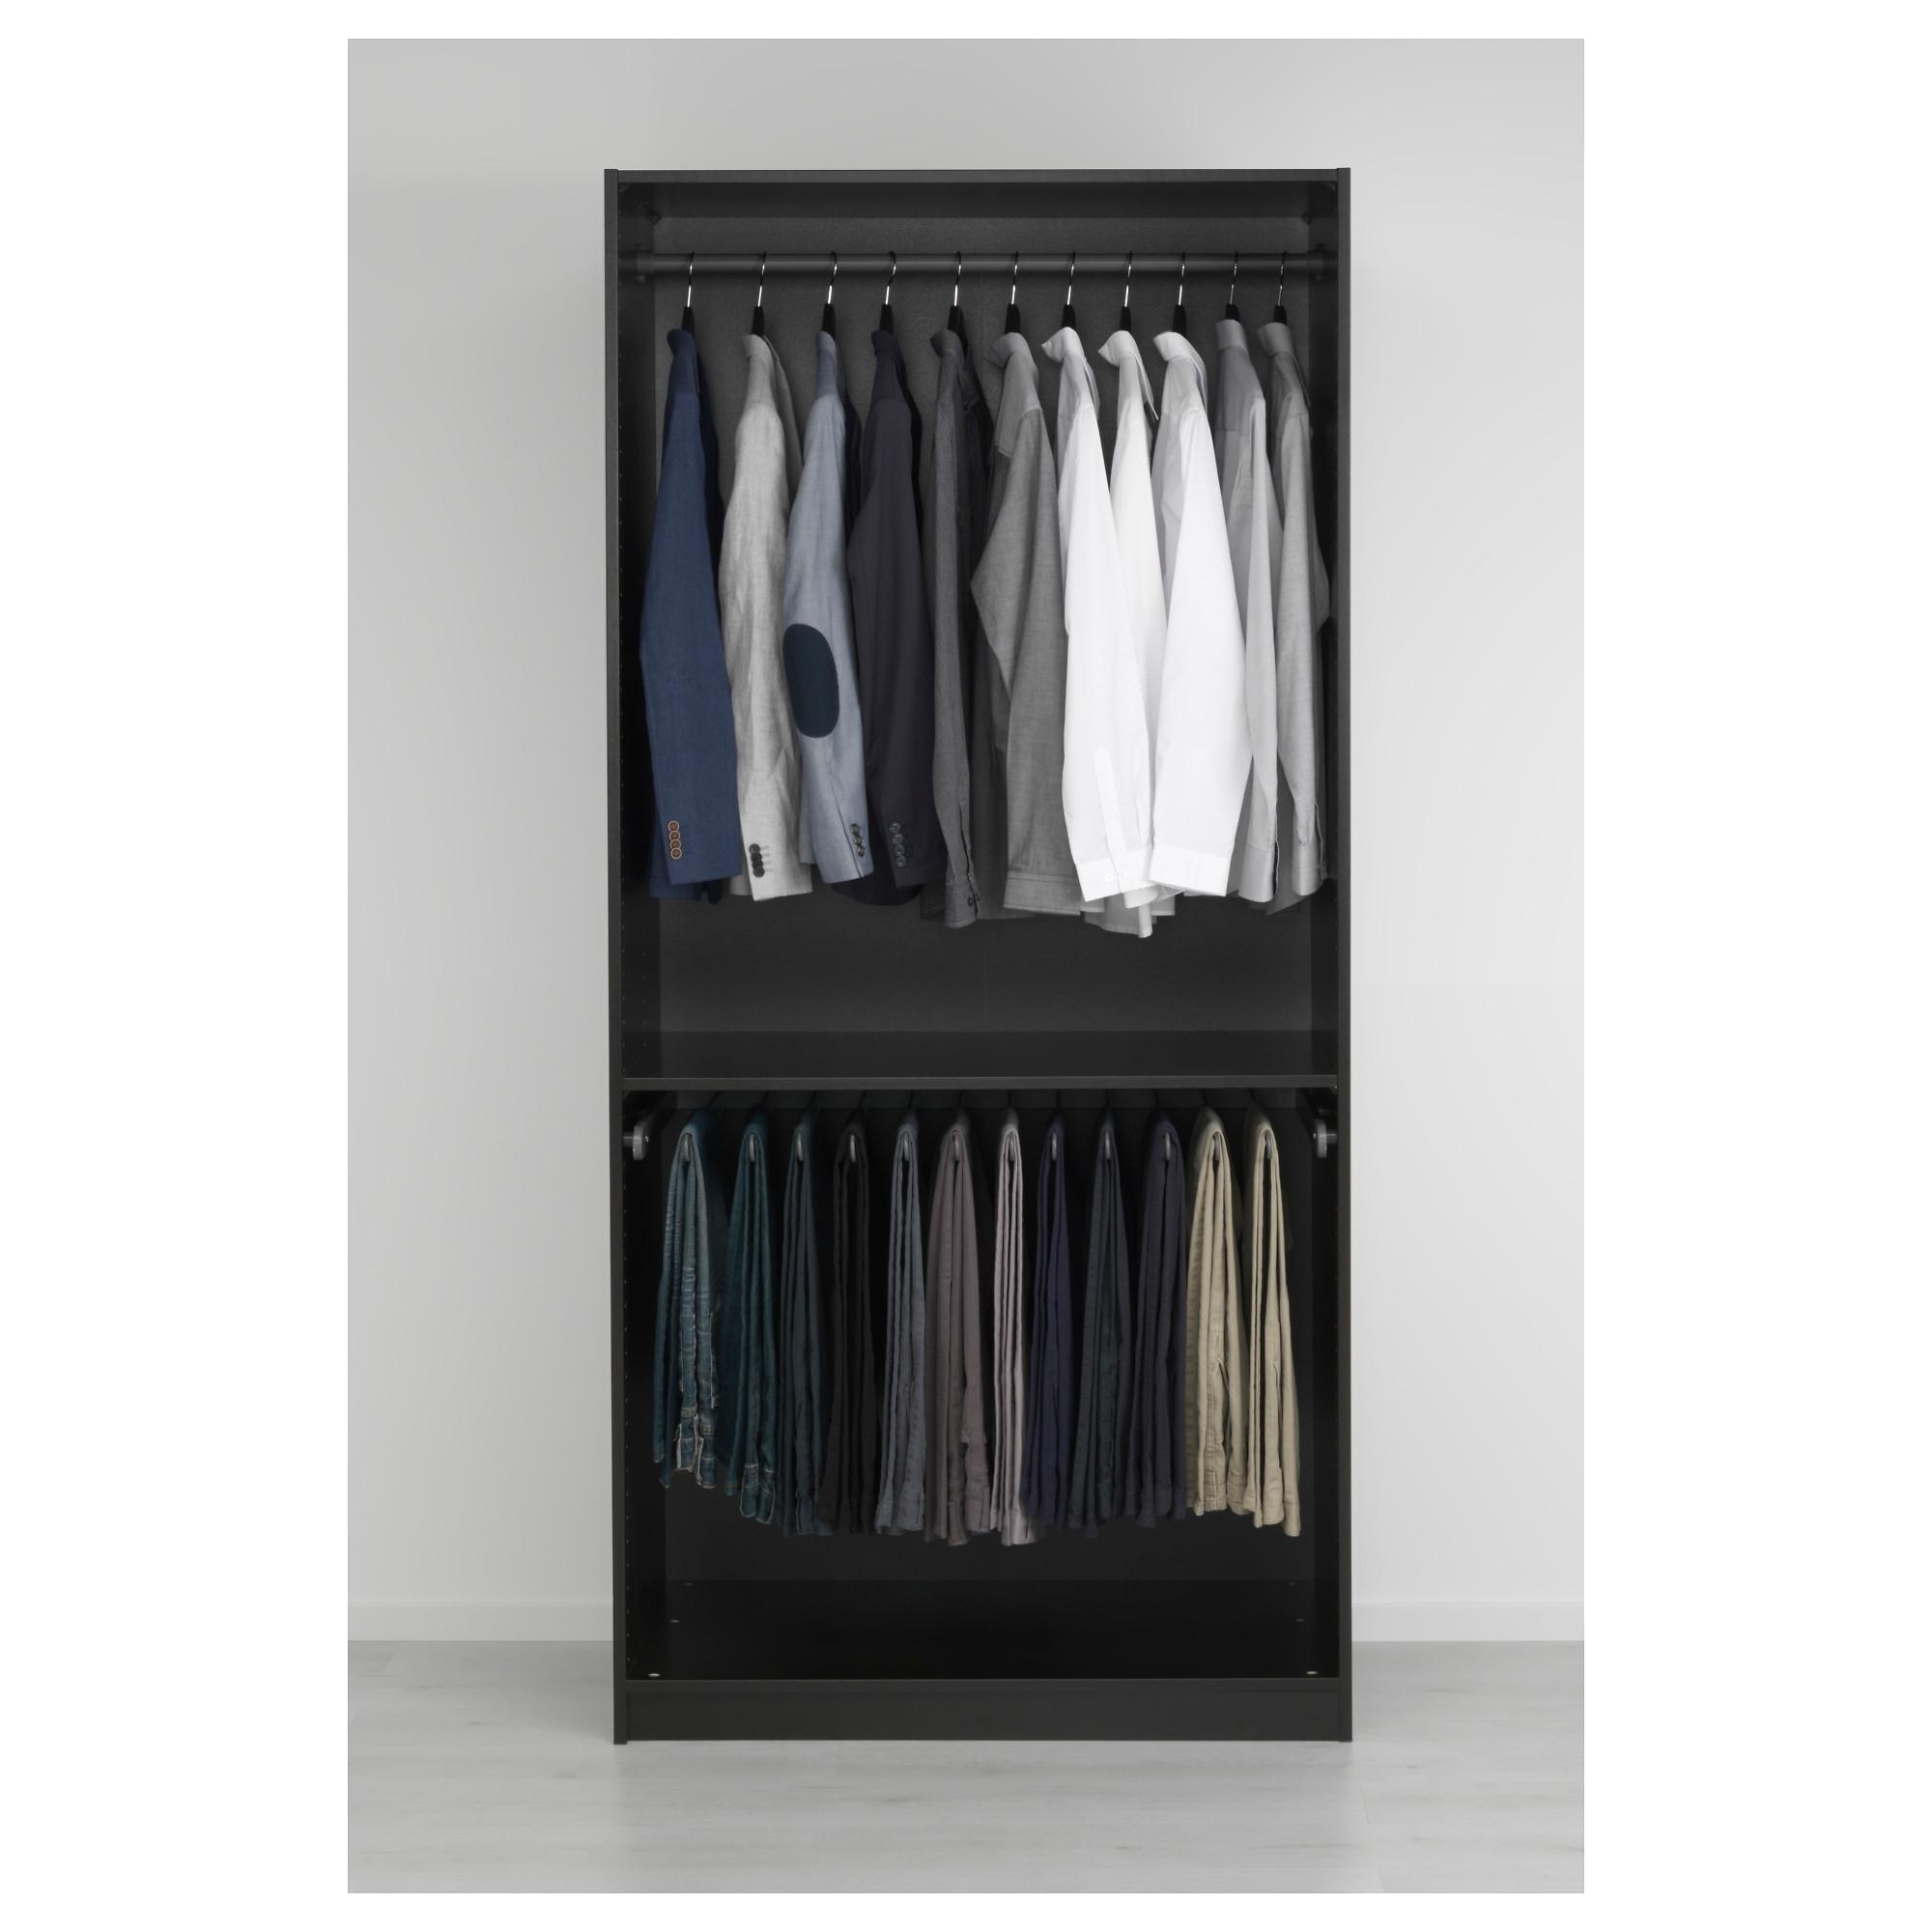 2017 Black Glass Wardrobes For Pax Wardrobe Black Brown/vikedal Mirror Glass 100X60X201 Cm – Ikea (View 1 of 15)